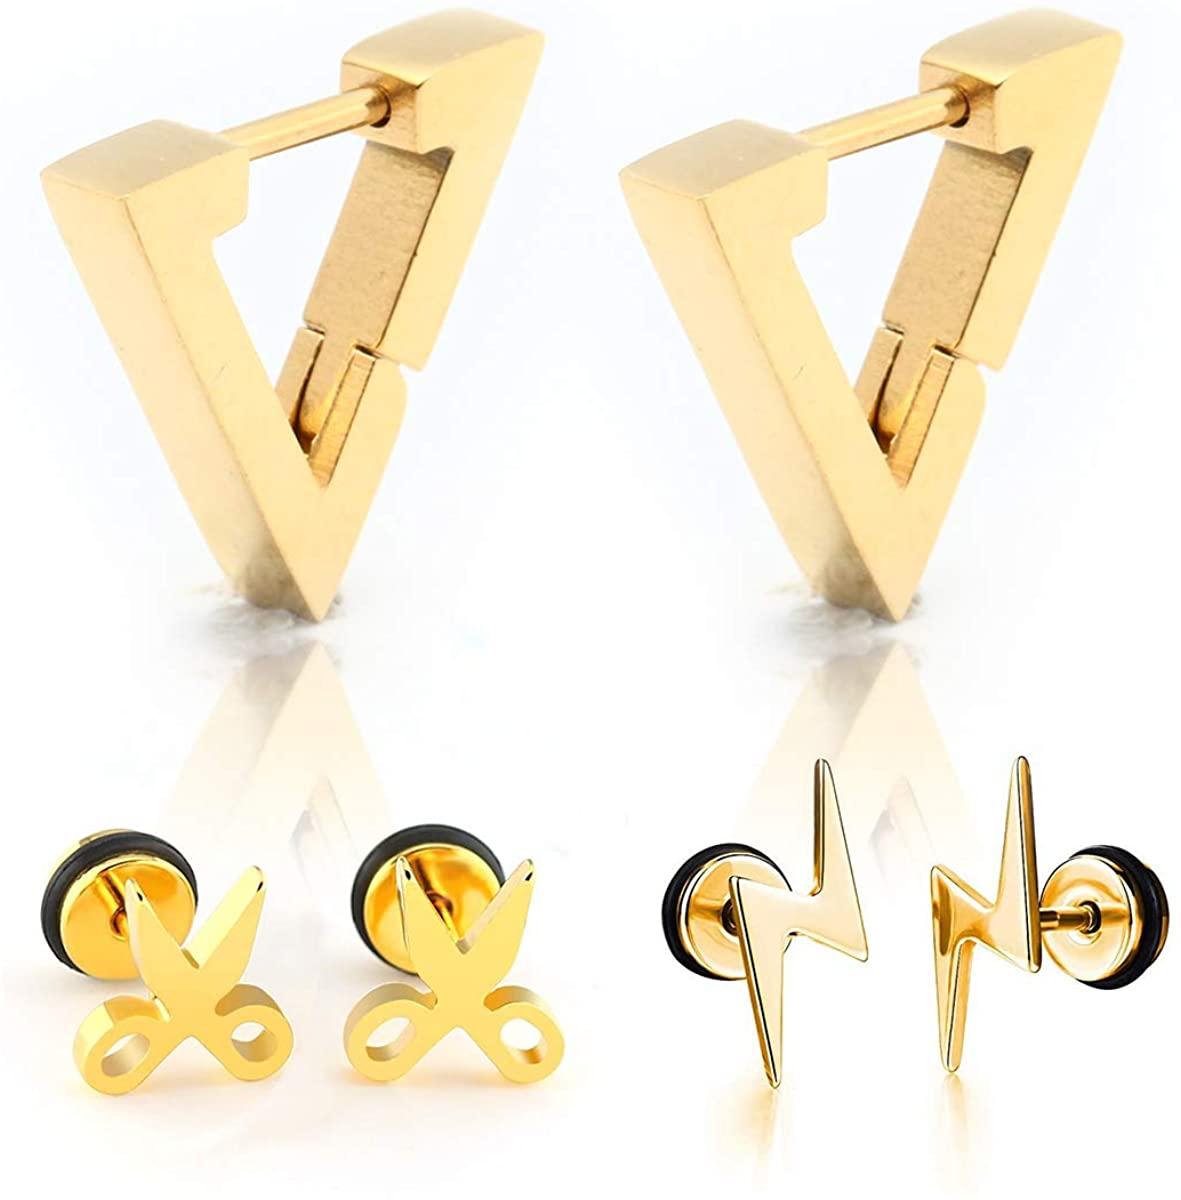 3 Pairs Punk Style Stainless Steel Triangle Lightning Scissors Shape Kpop Style Earrings Set for Men Women